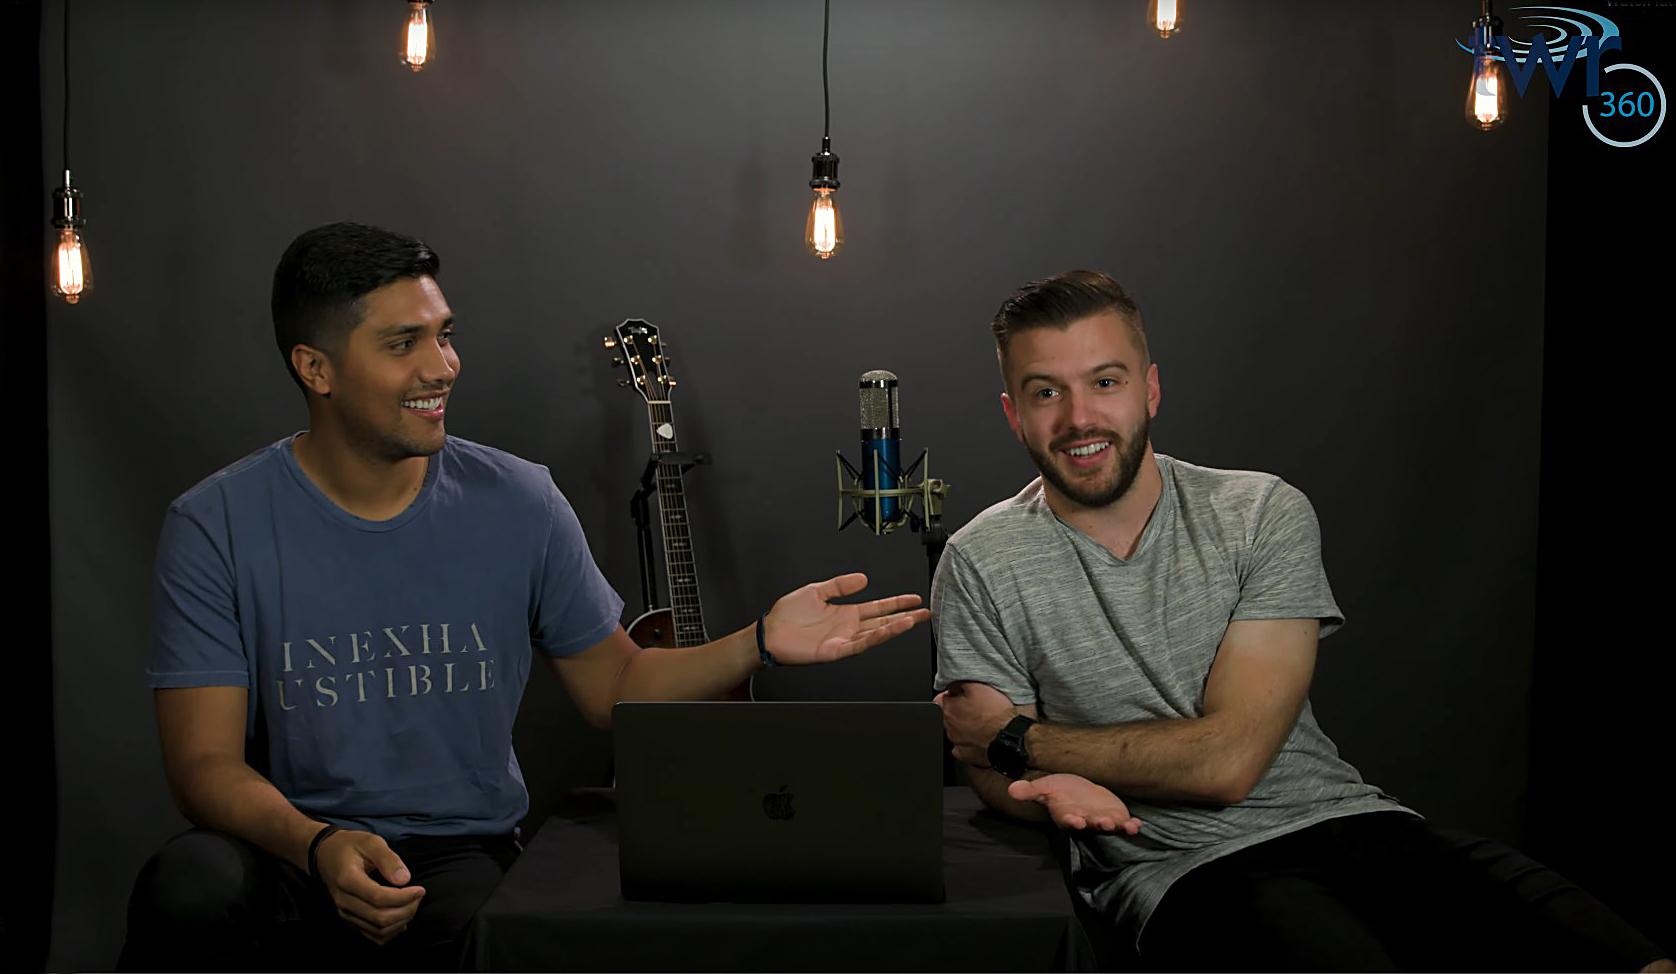 TWR360 unveils video devotional series featuring Christian singer Evan Craft